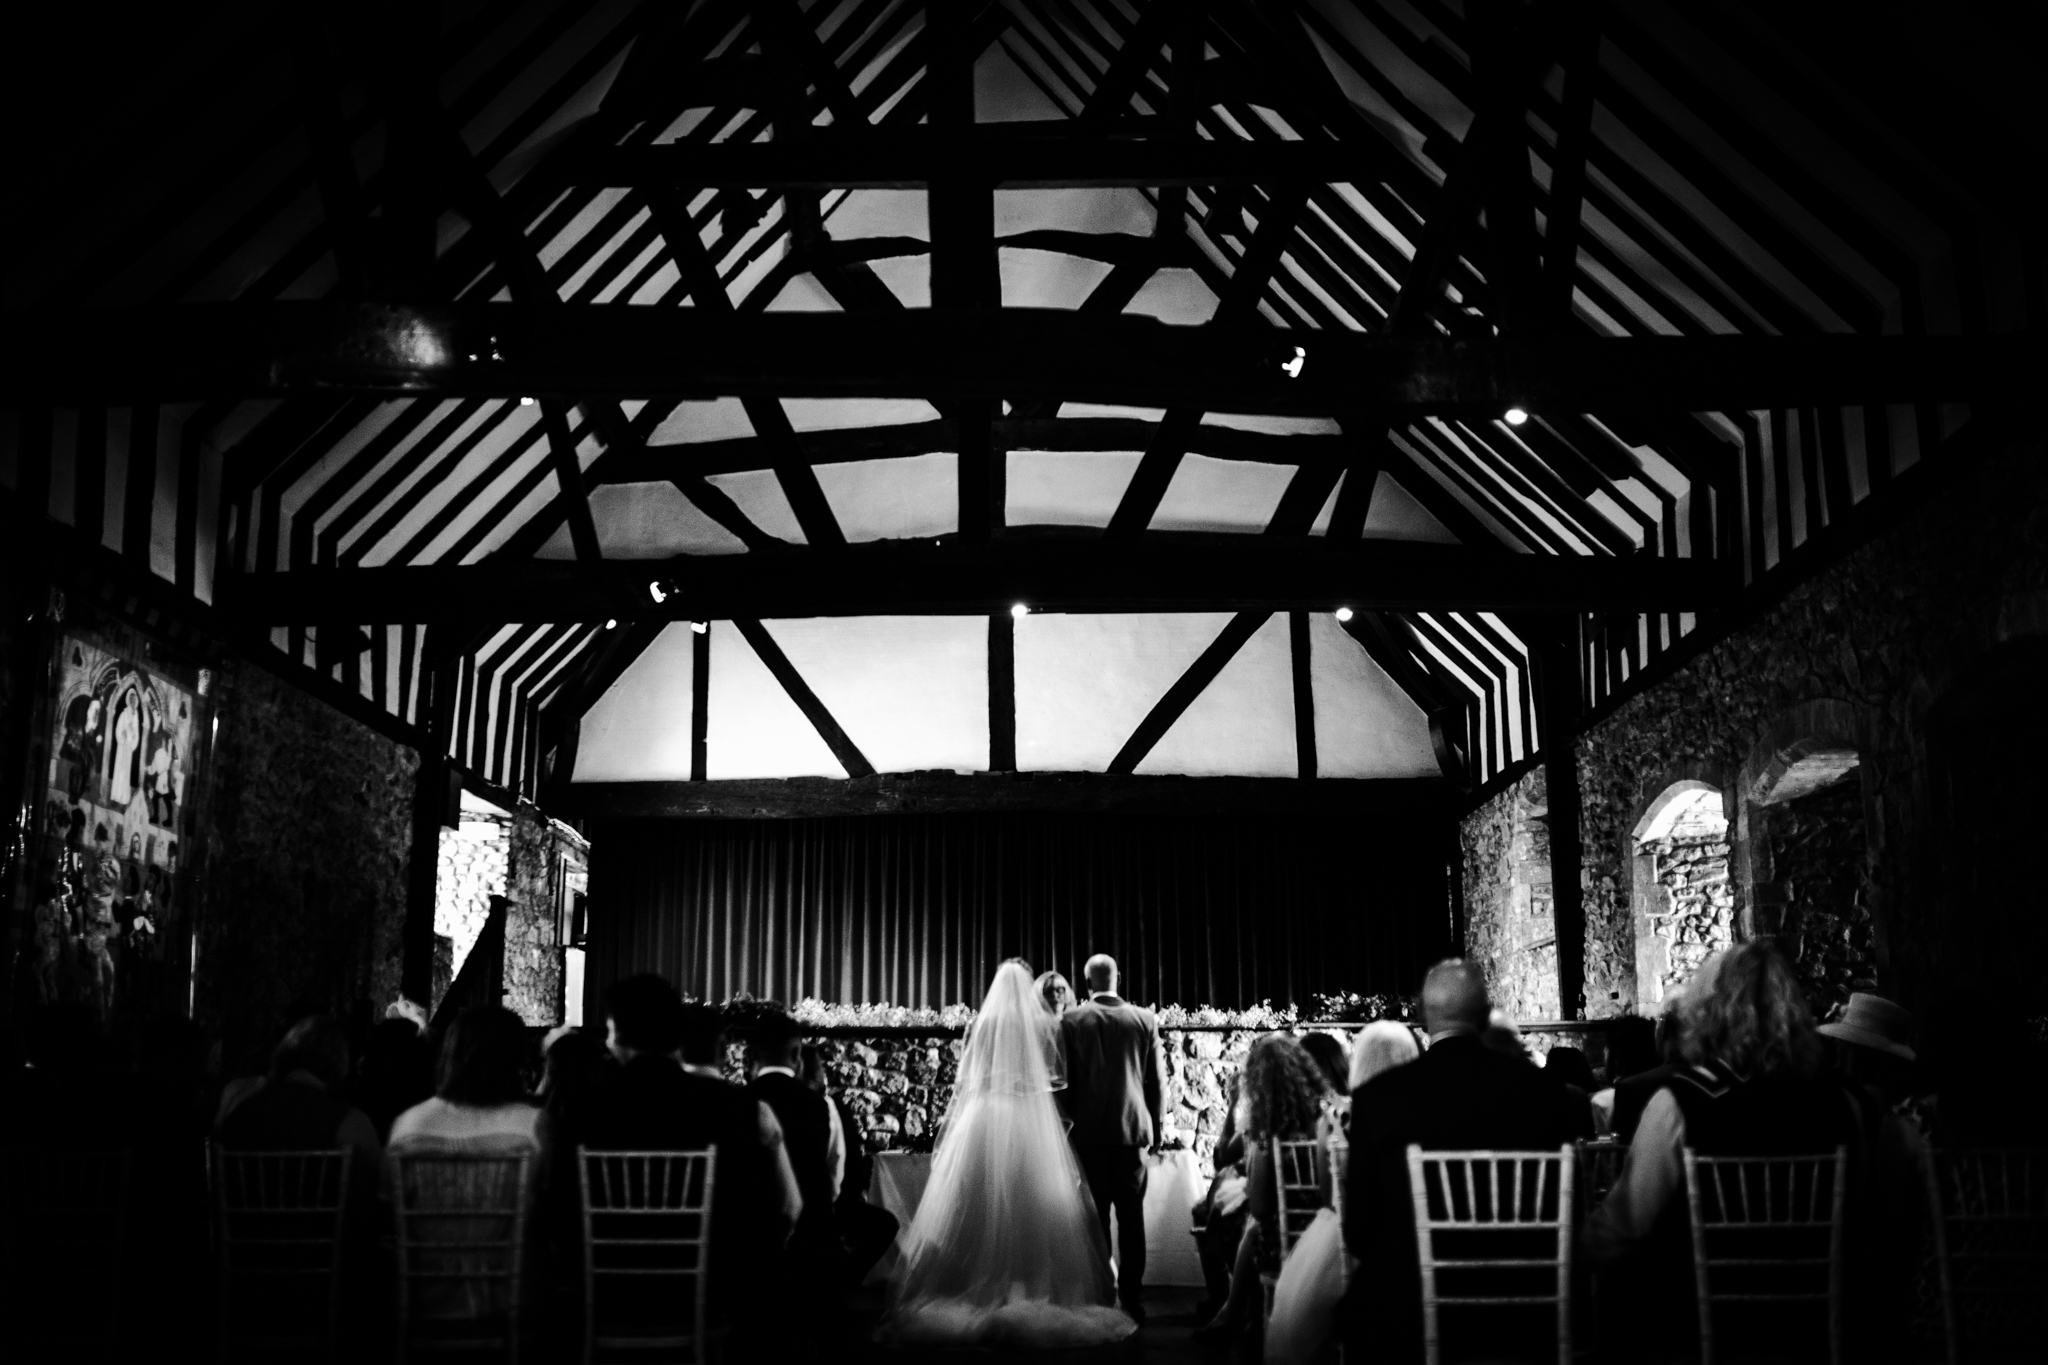 Detail of a tudor style wedding venue